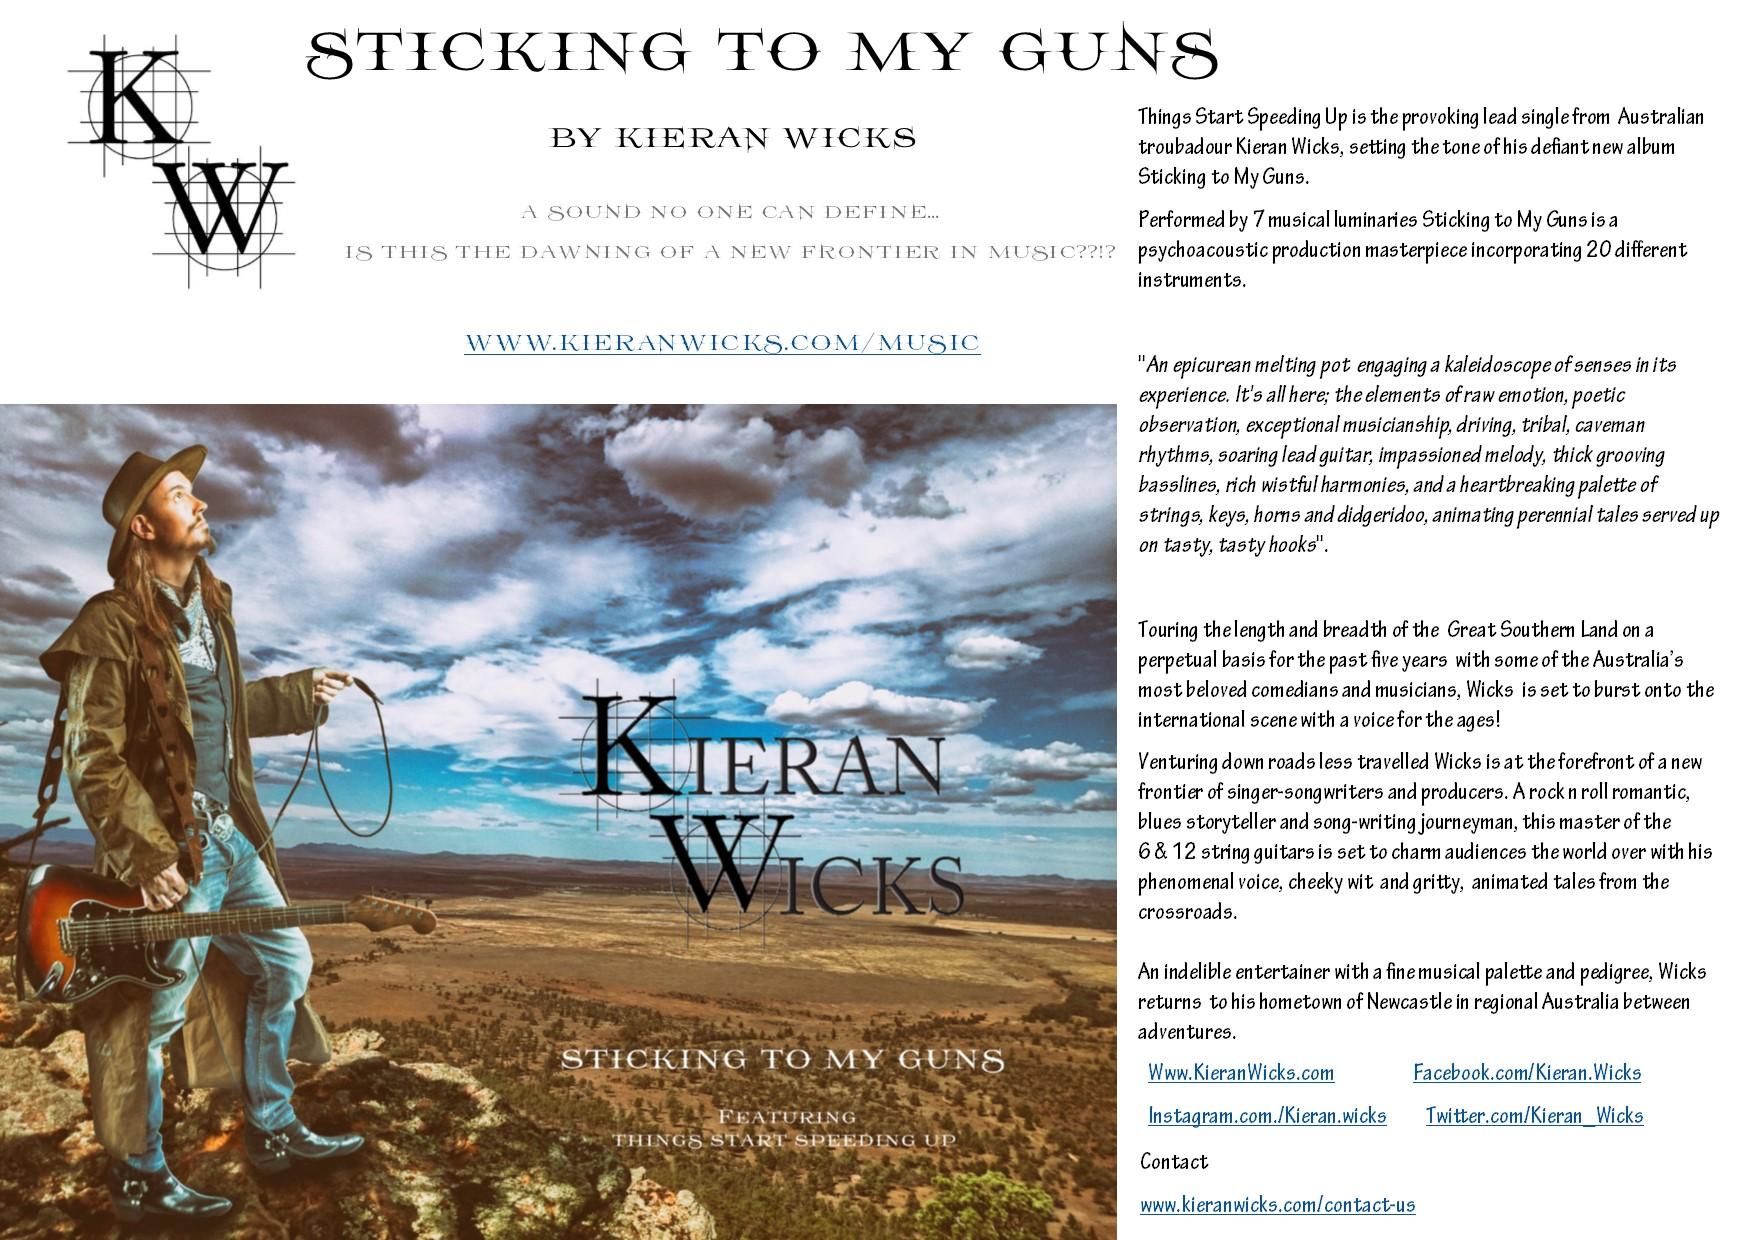 Kieran Wicks - Biography 230617